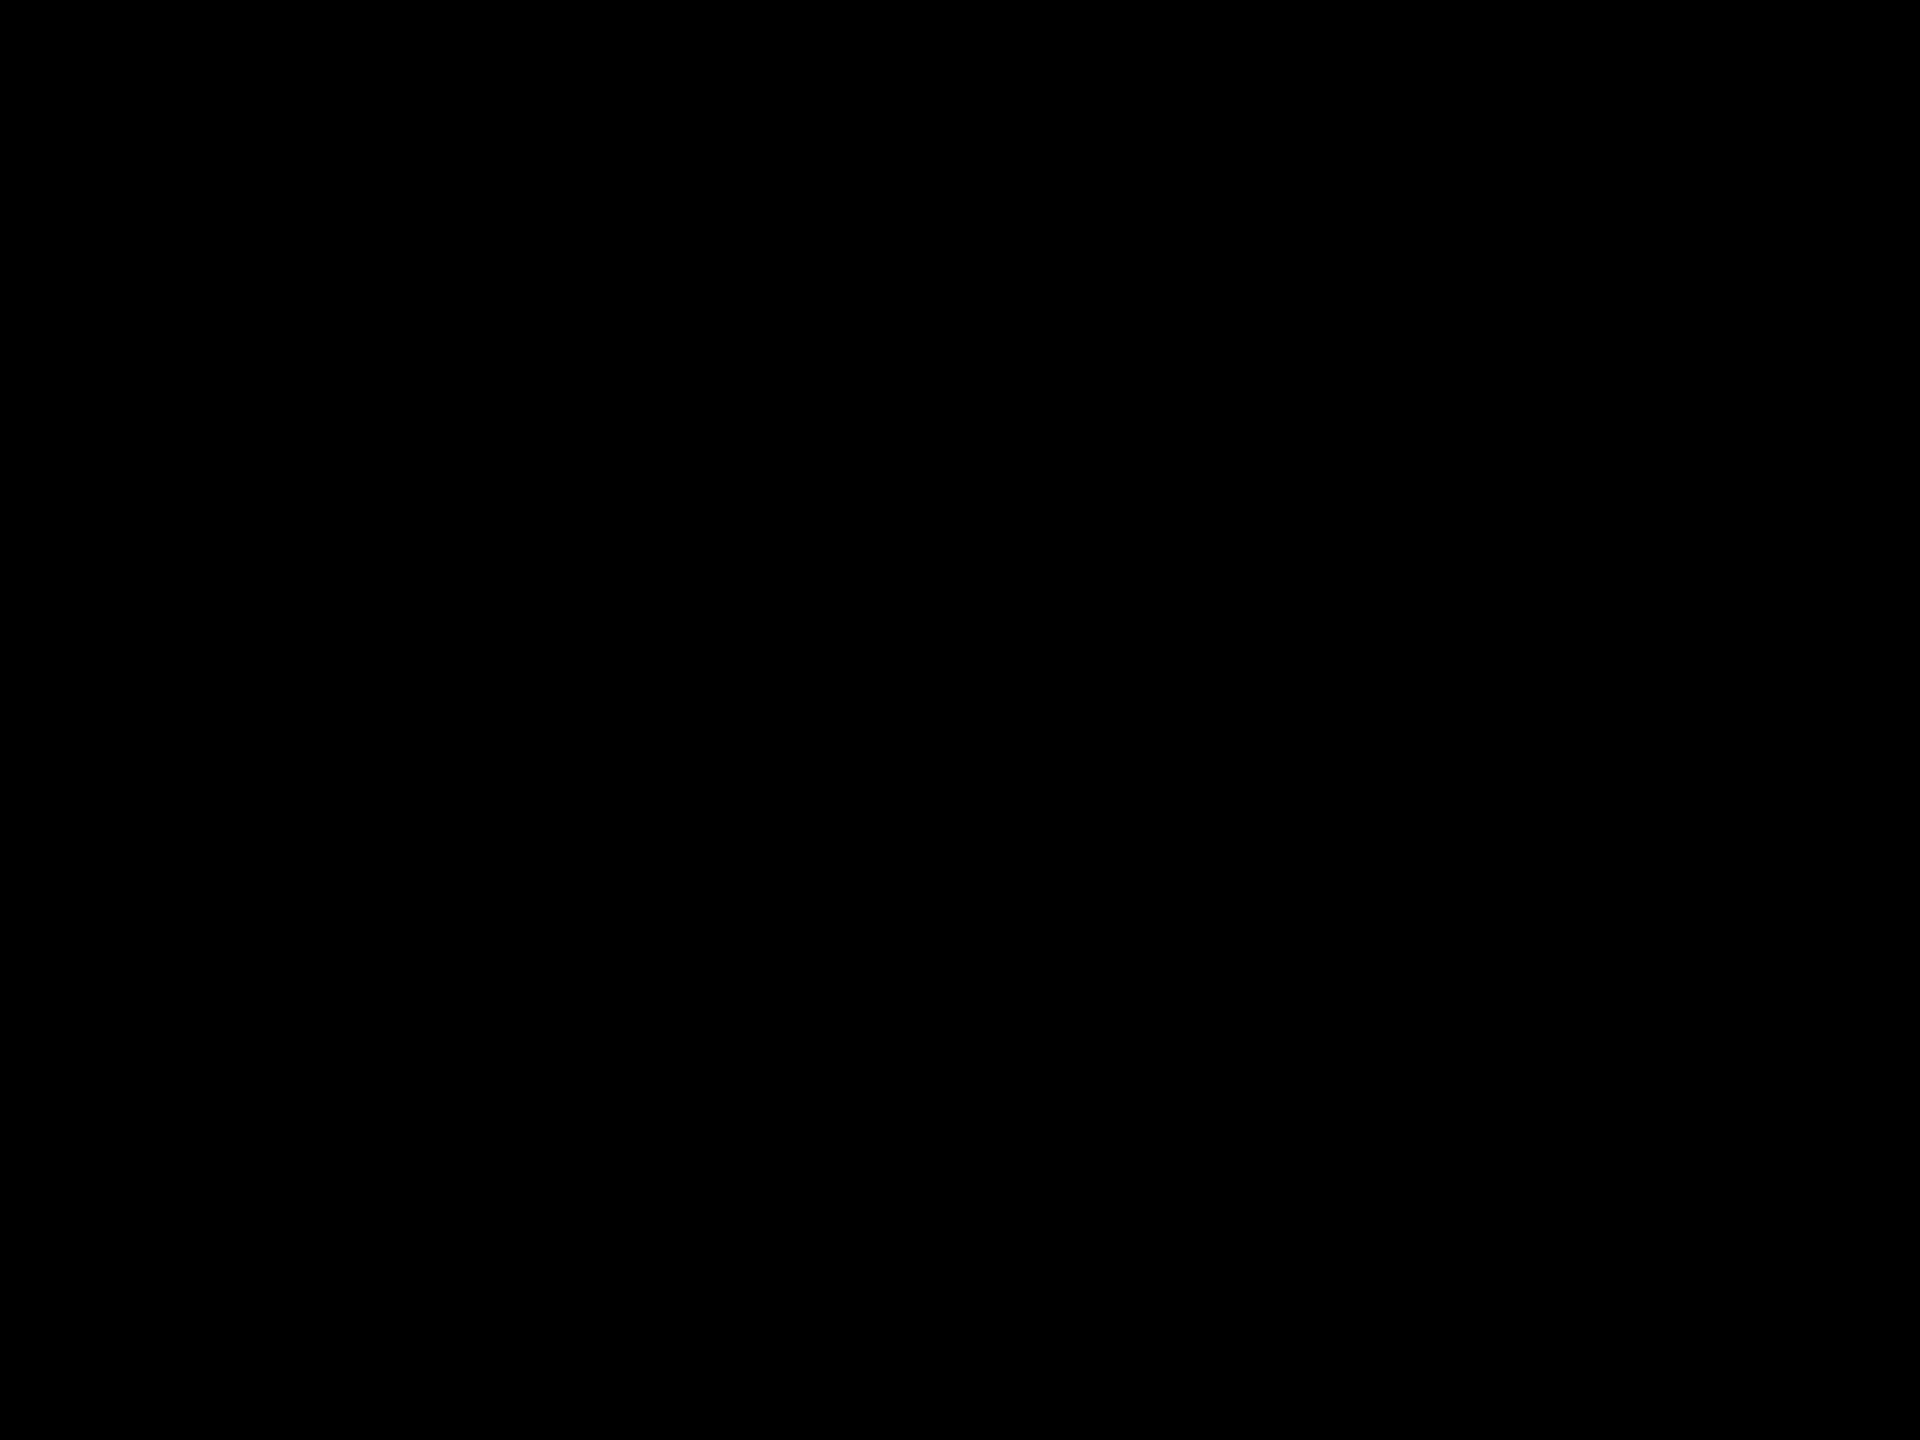 東急電鉄 5050系の型紙